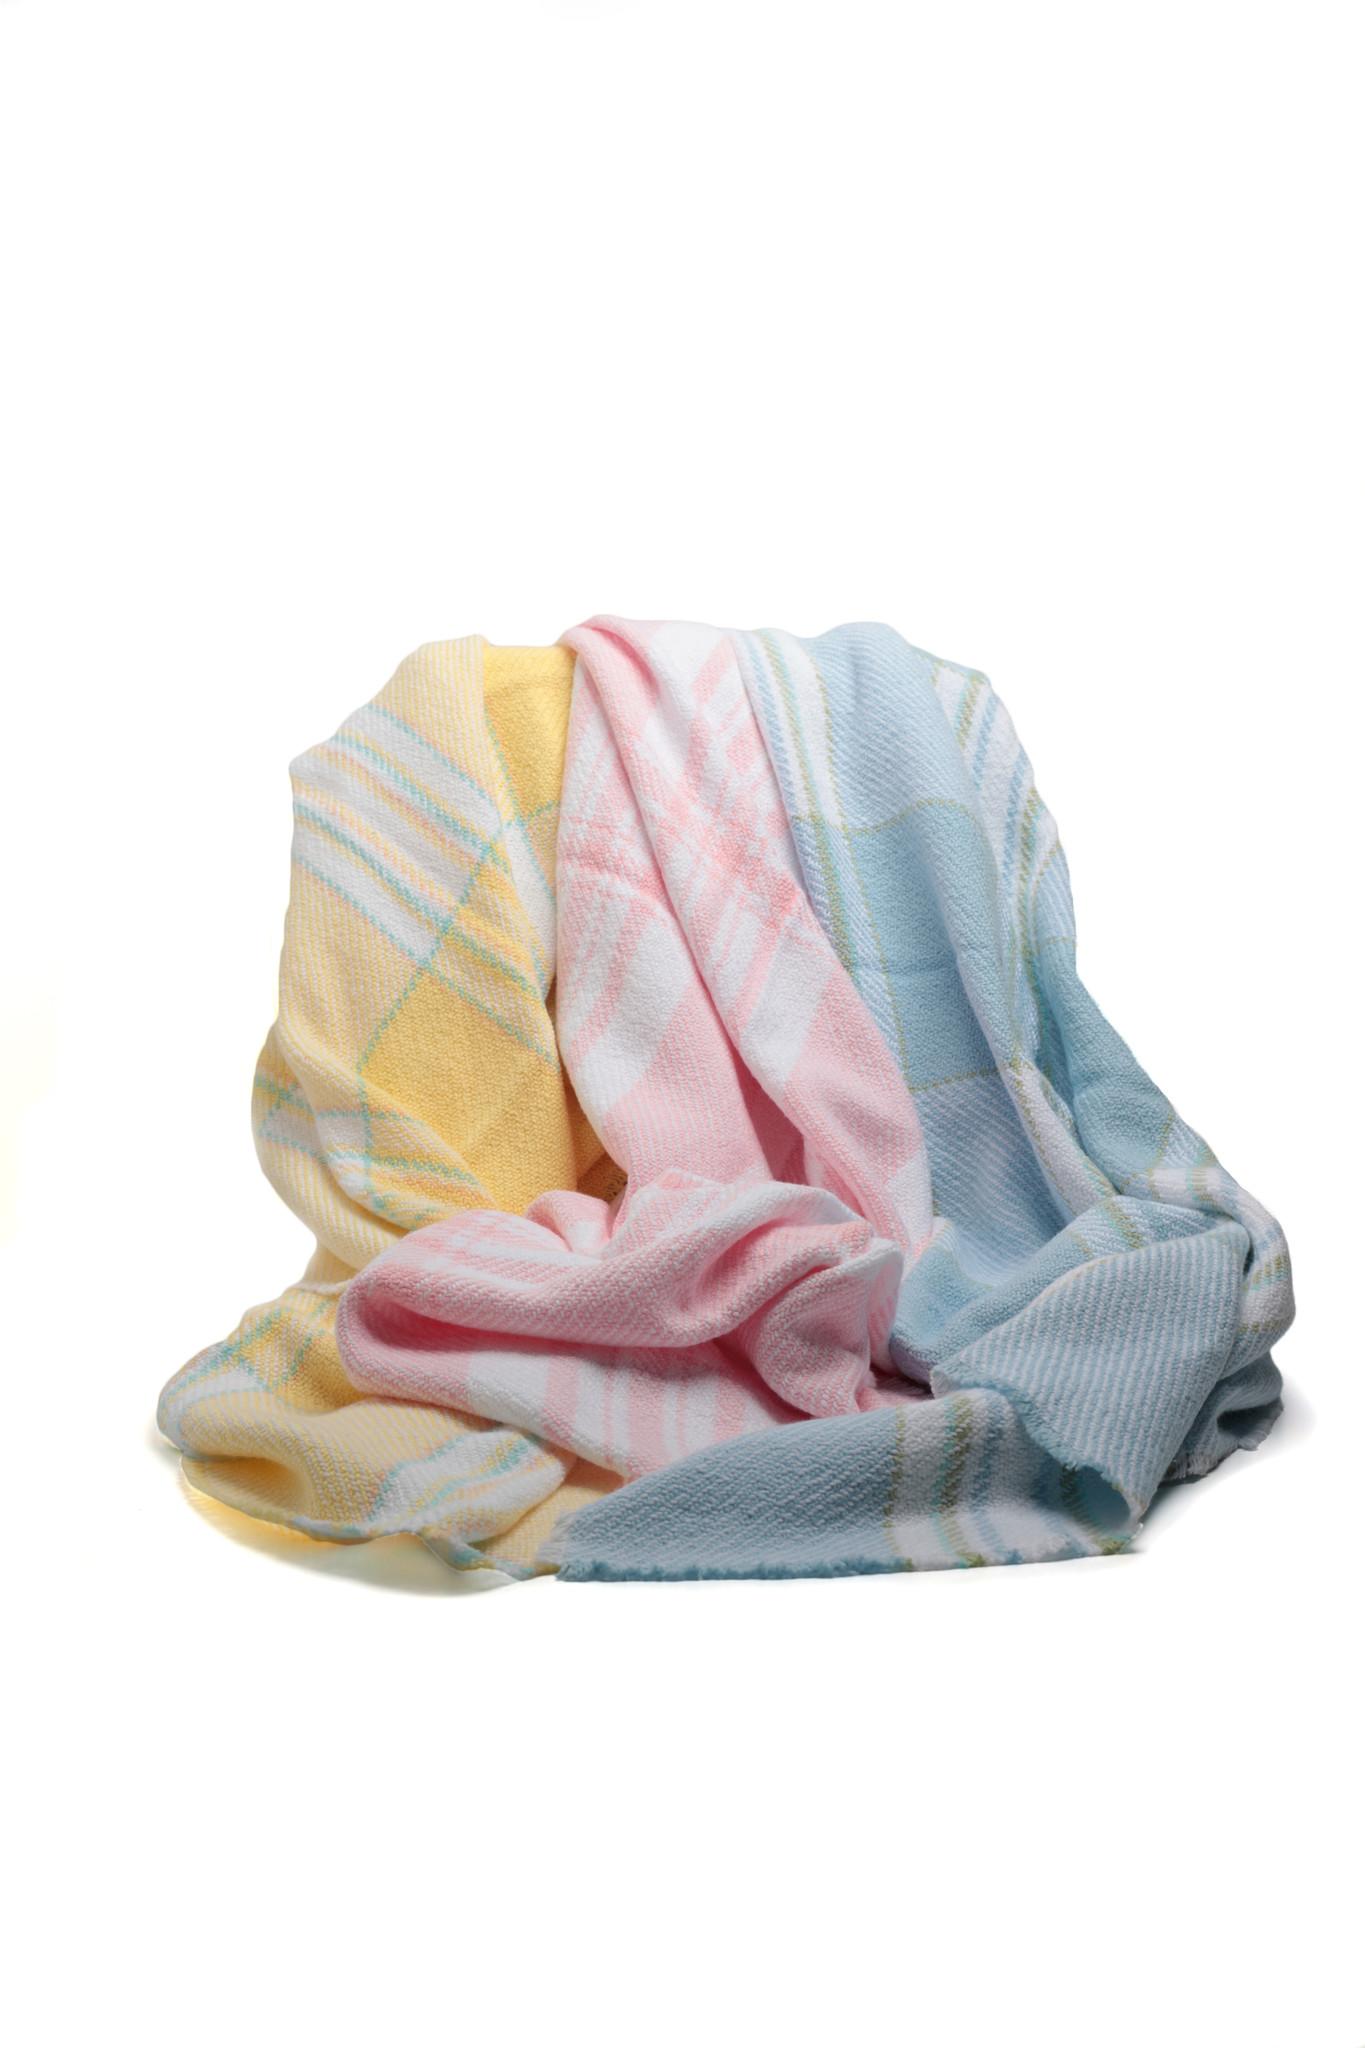 Plaid Baby Blankets-2